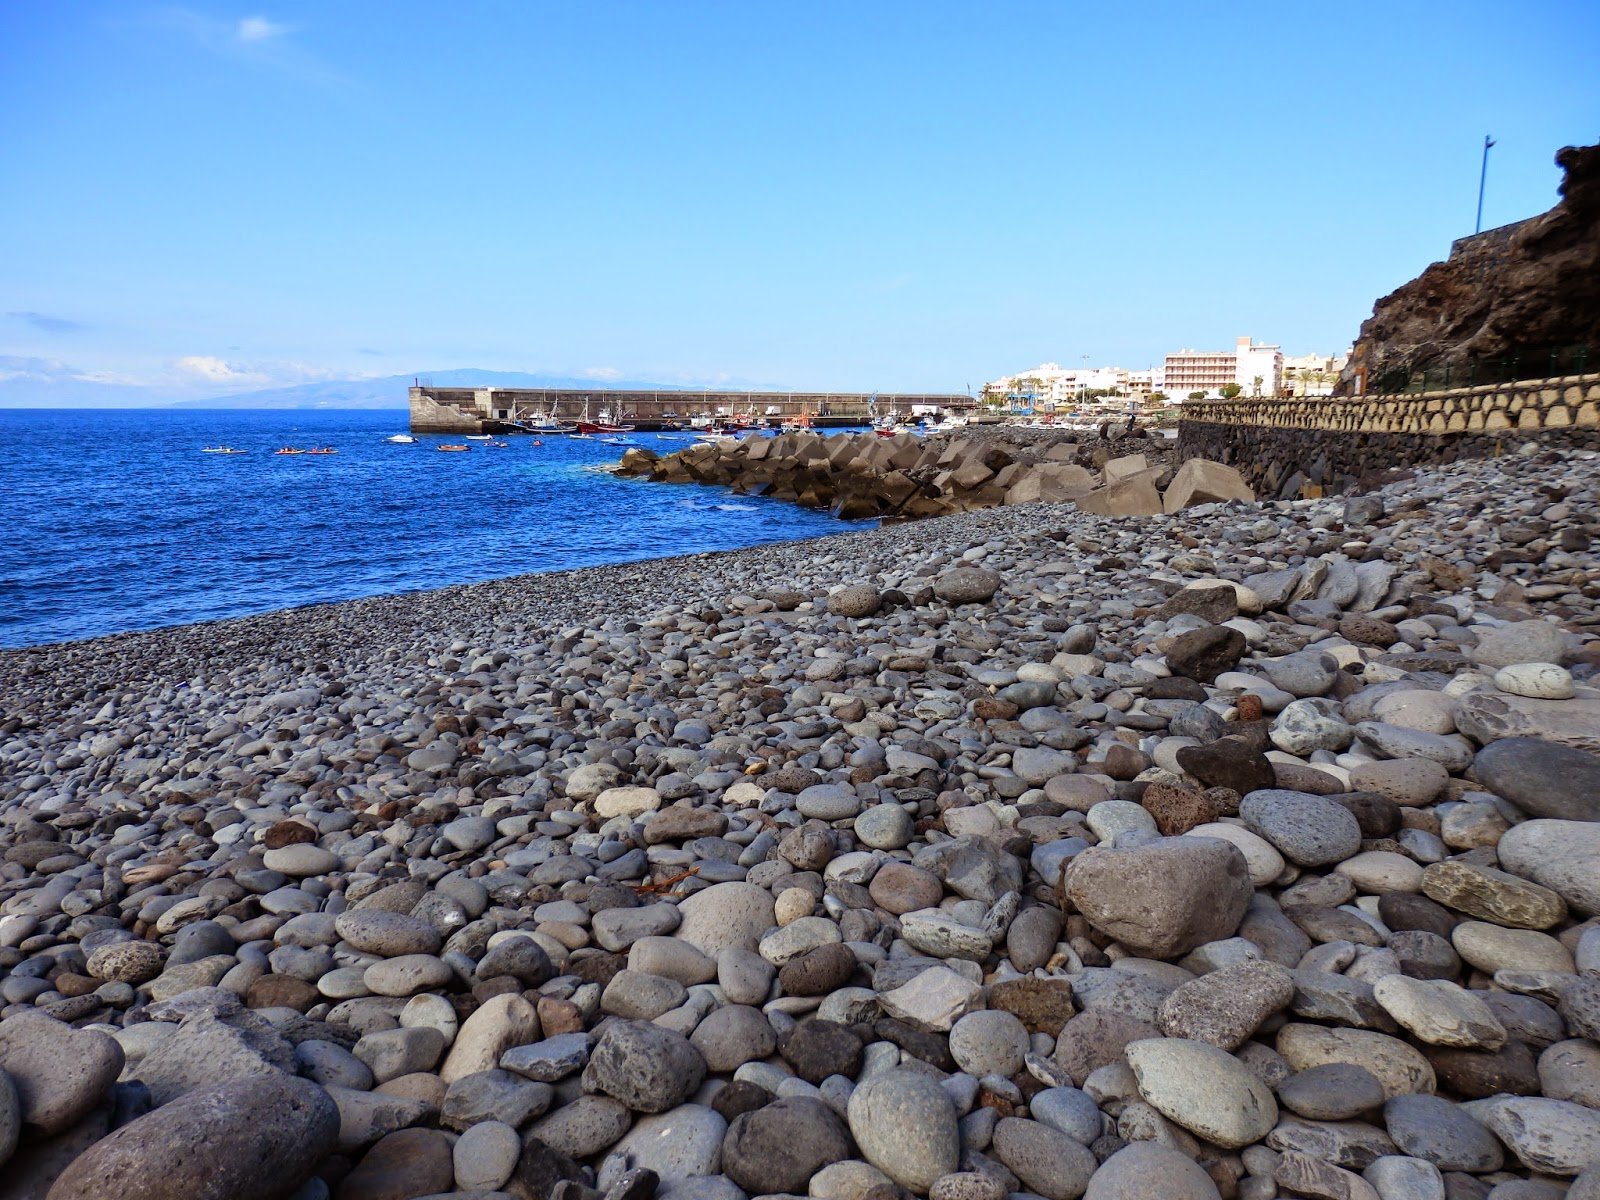 Pebble beach Tenerife